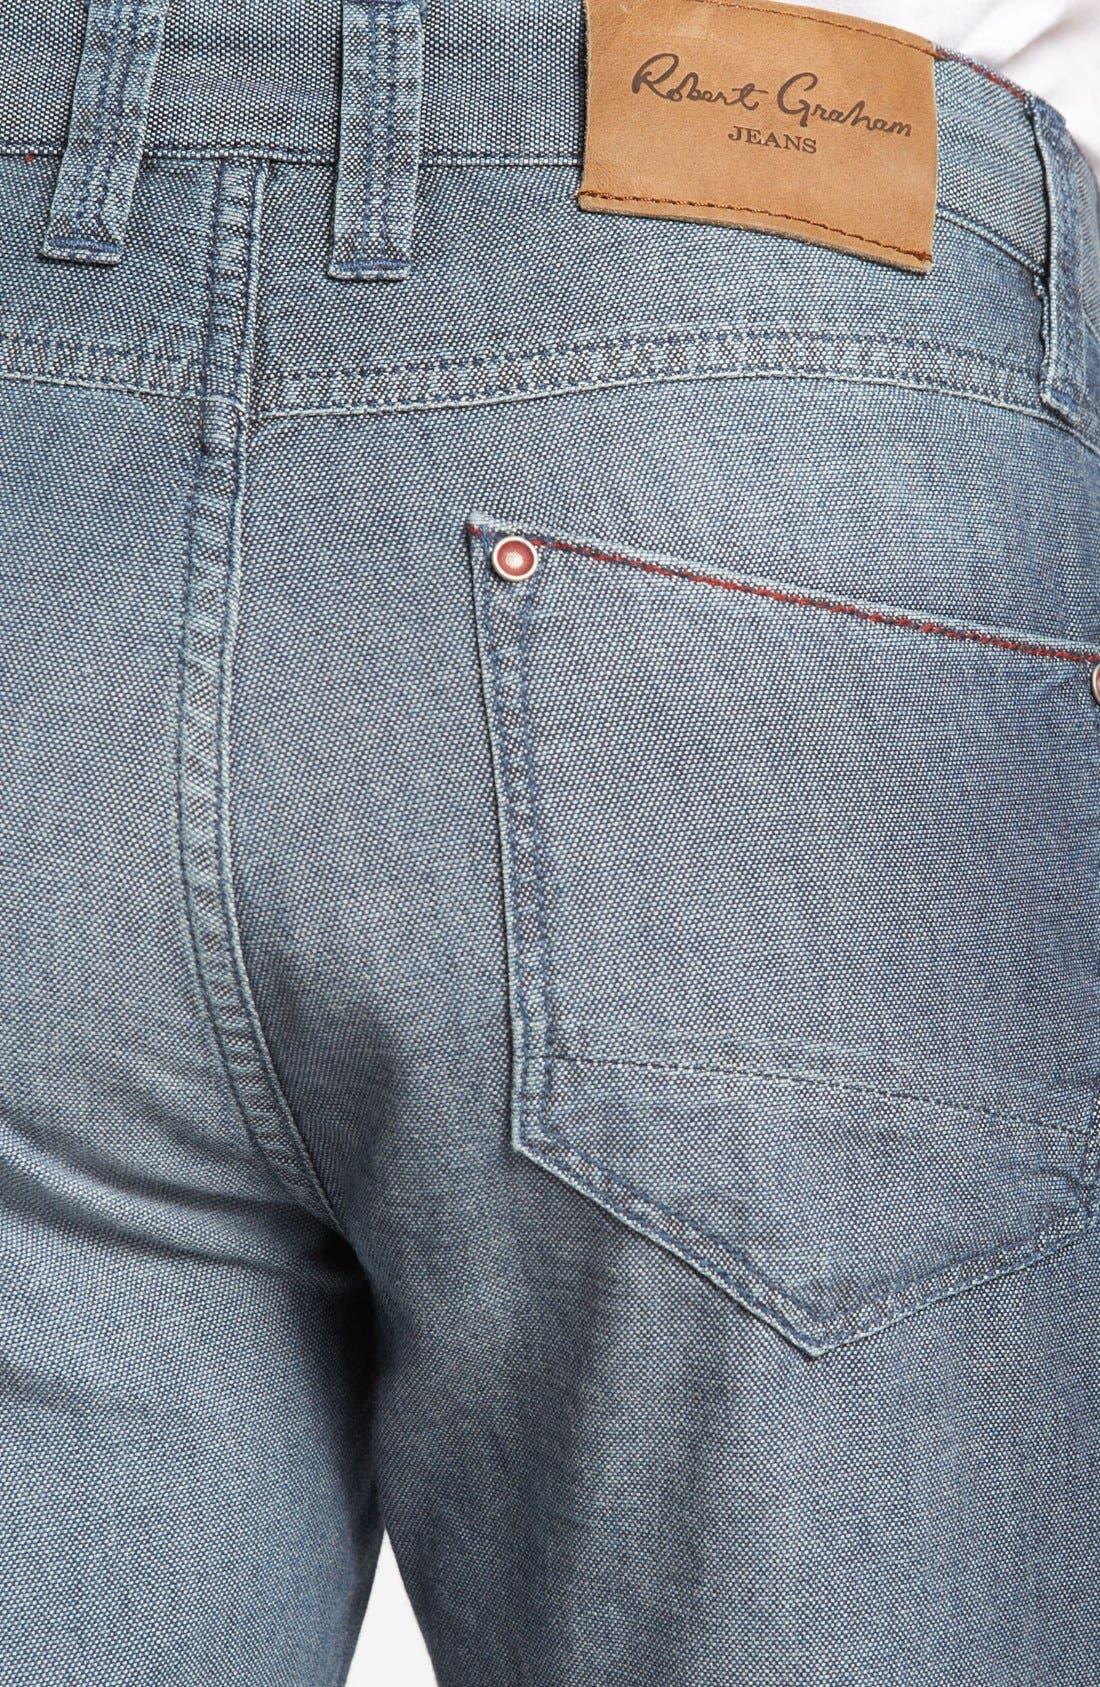 Alternate Image 4  - Robert Graham 'Denim Nails' Classic Fit Jeans (Indigo)